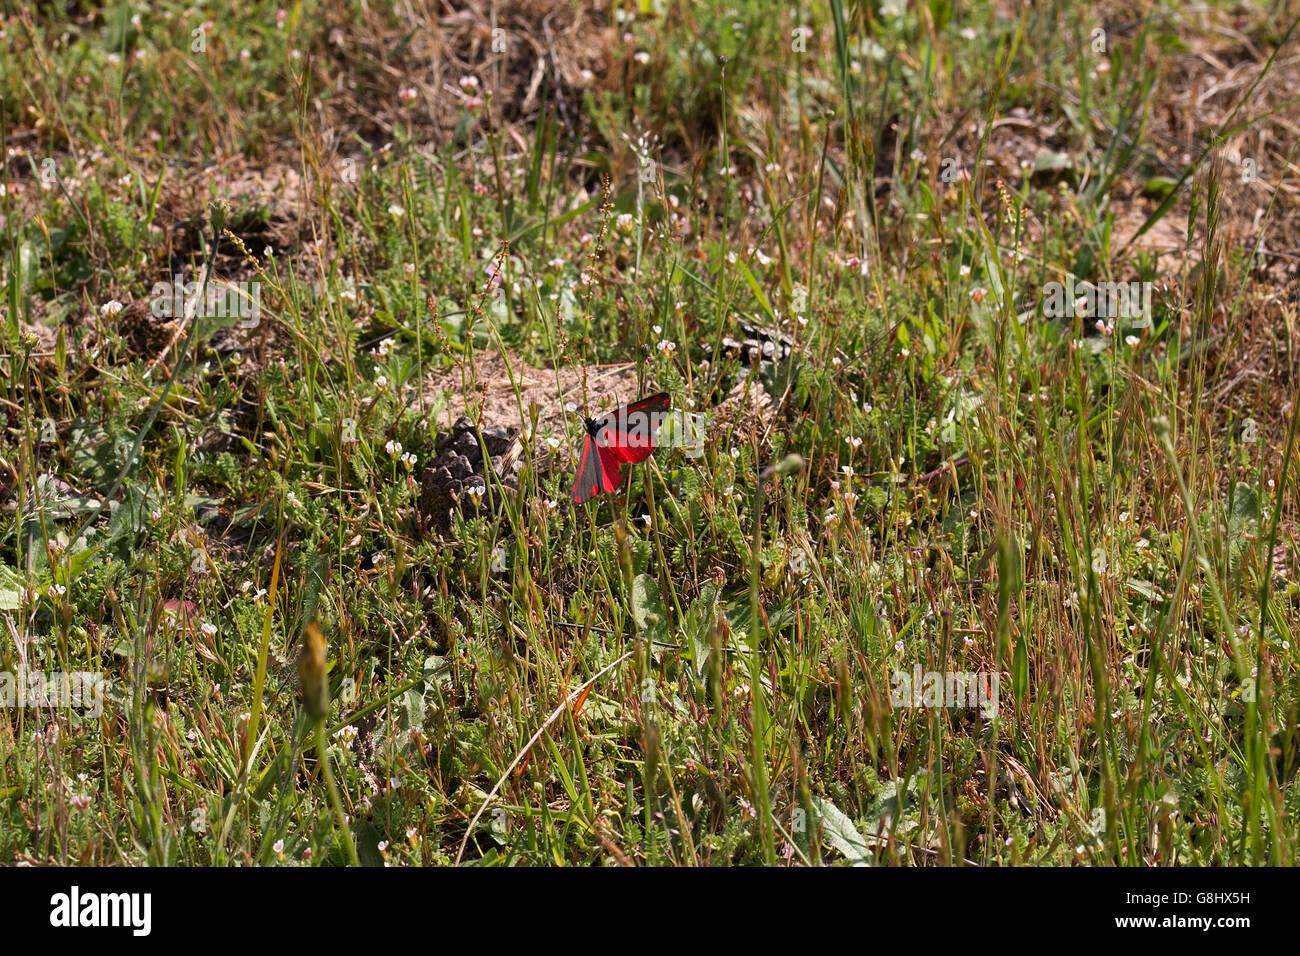 Jakobskrautbär auf einer Wiese in der Wulmstorfer Heide  Cinnabar moth on a meadow at the Wulmstorfer heathland - Stock Image